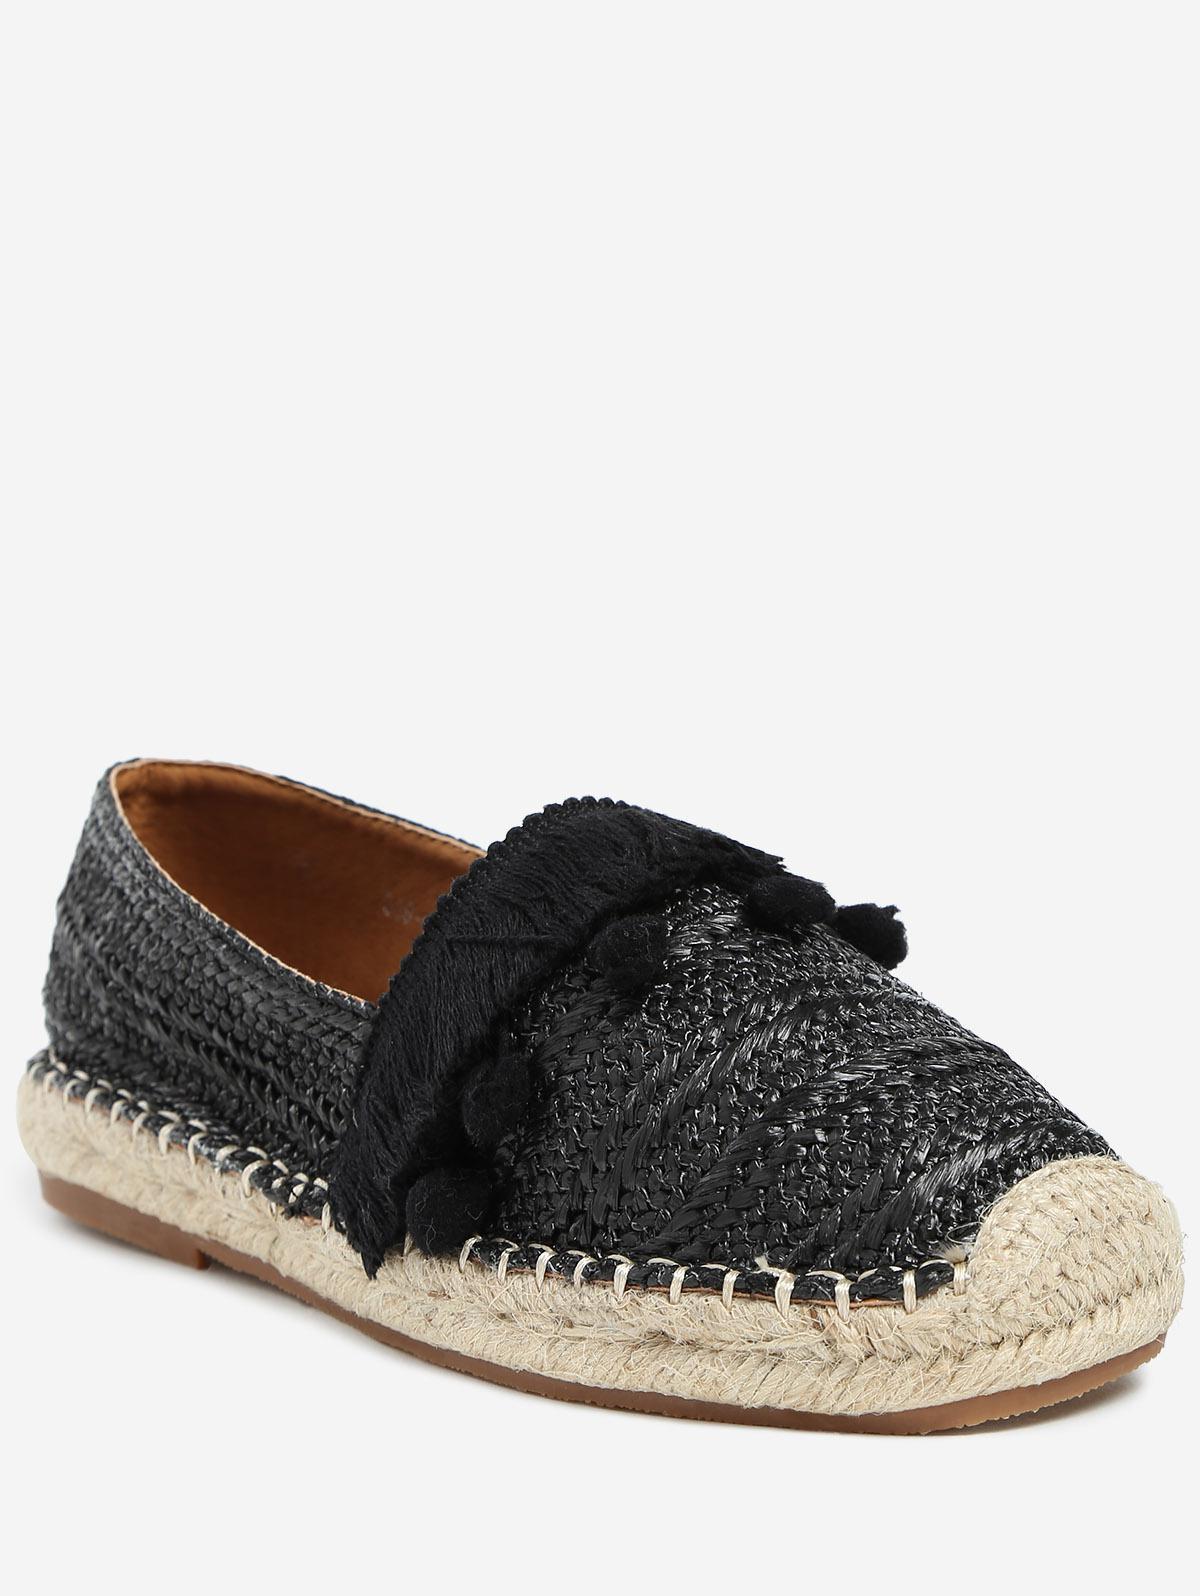 Beach Pom Pom Woven Straw Loafer Shoes